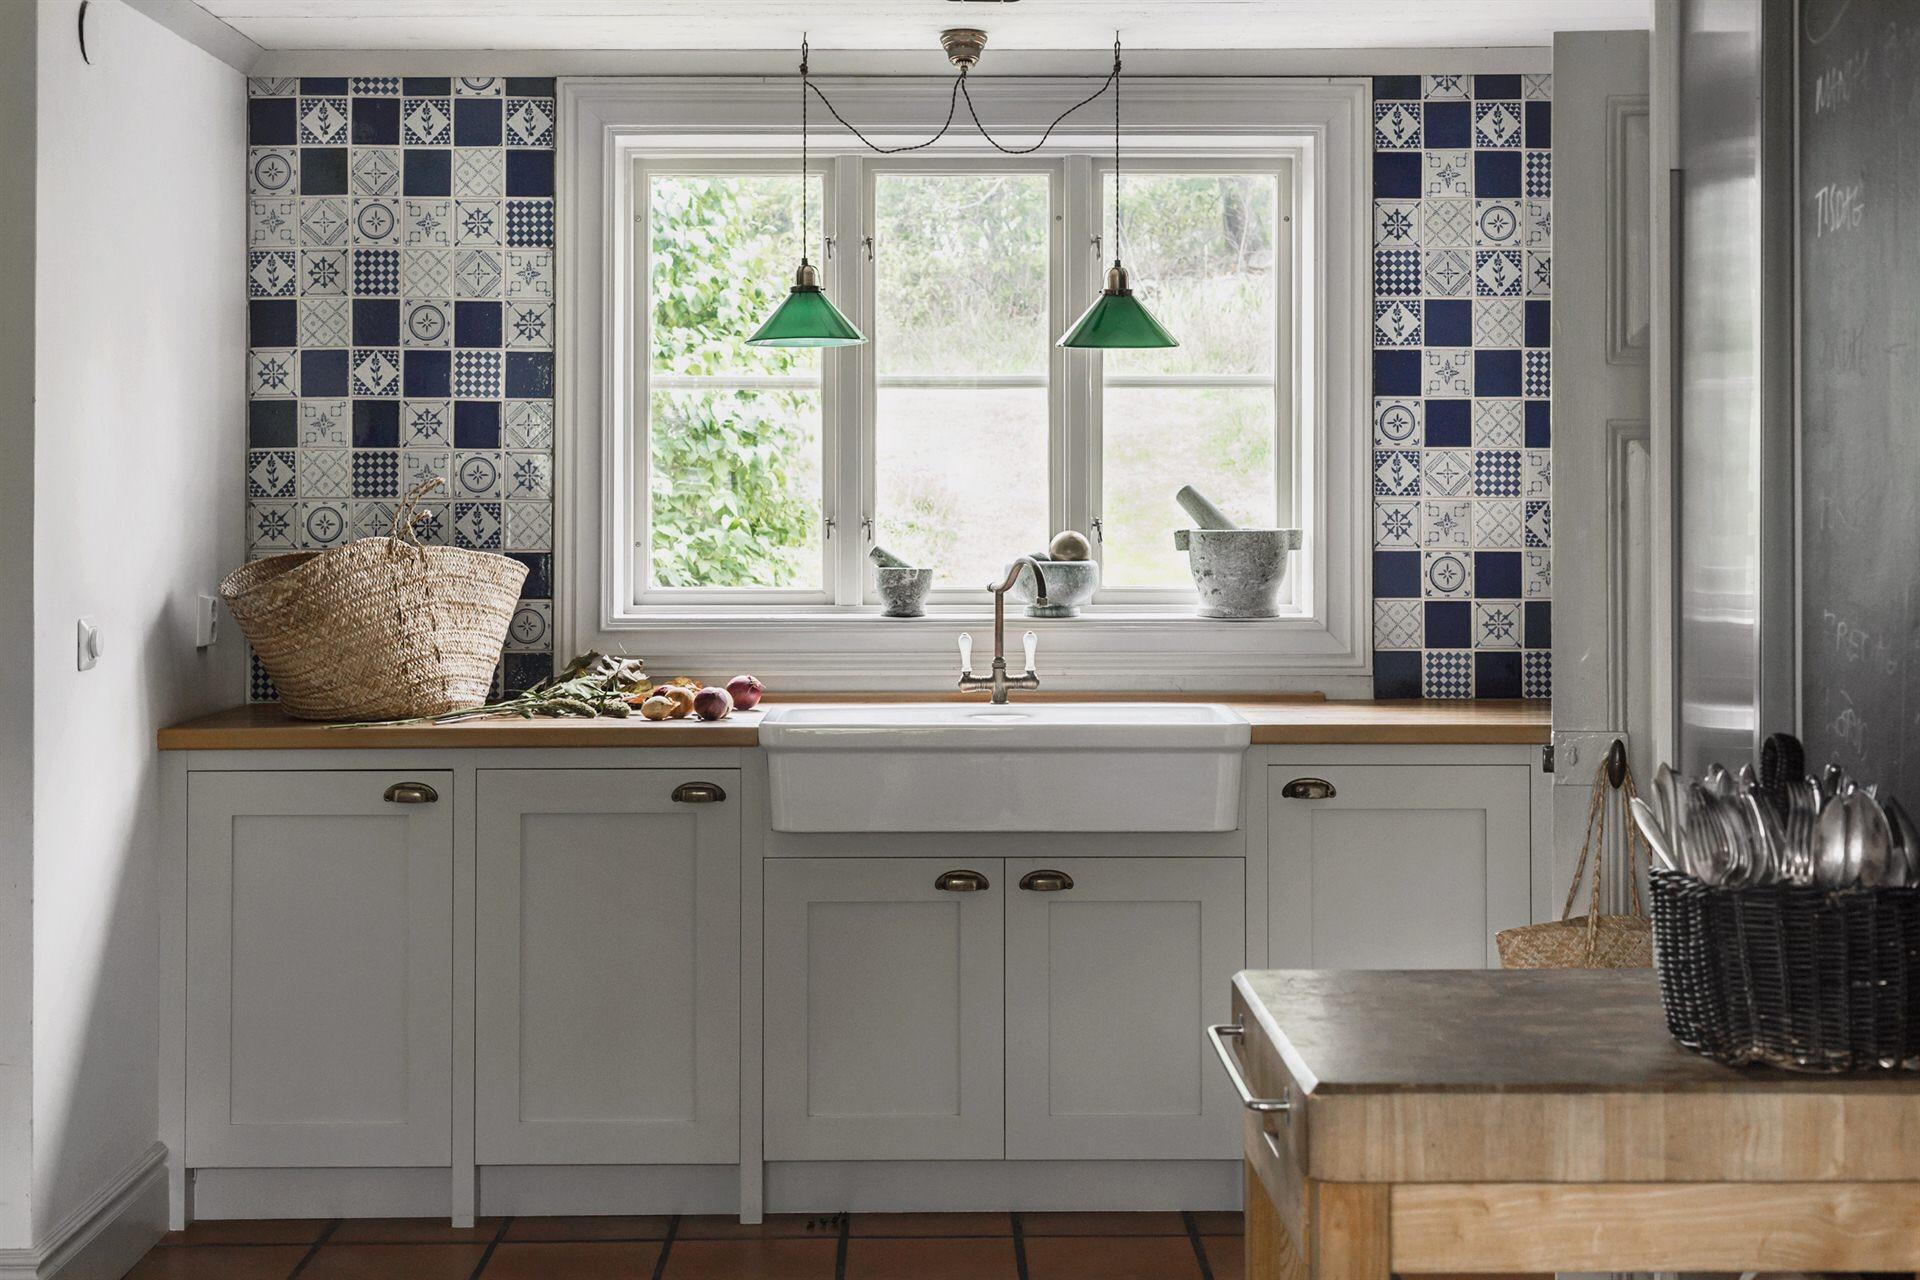 кухня окно плитка с узорами накладная раковина деревянная столешница